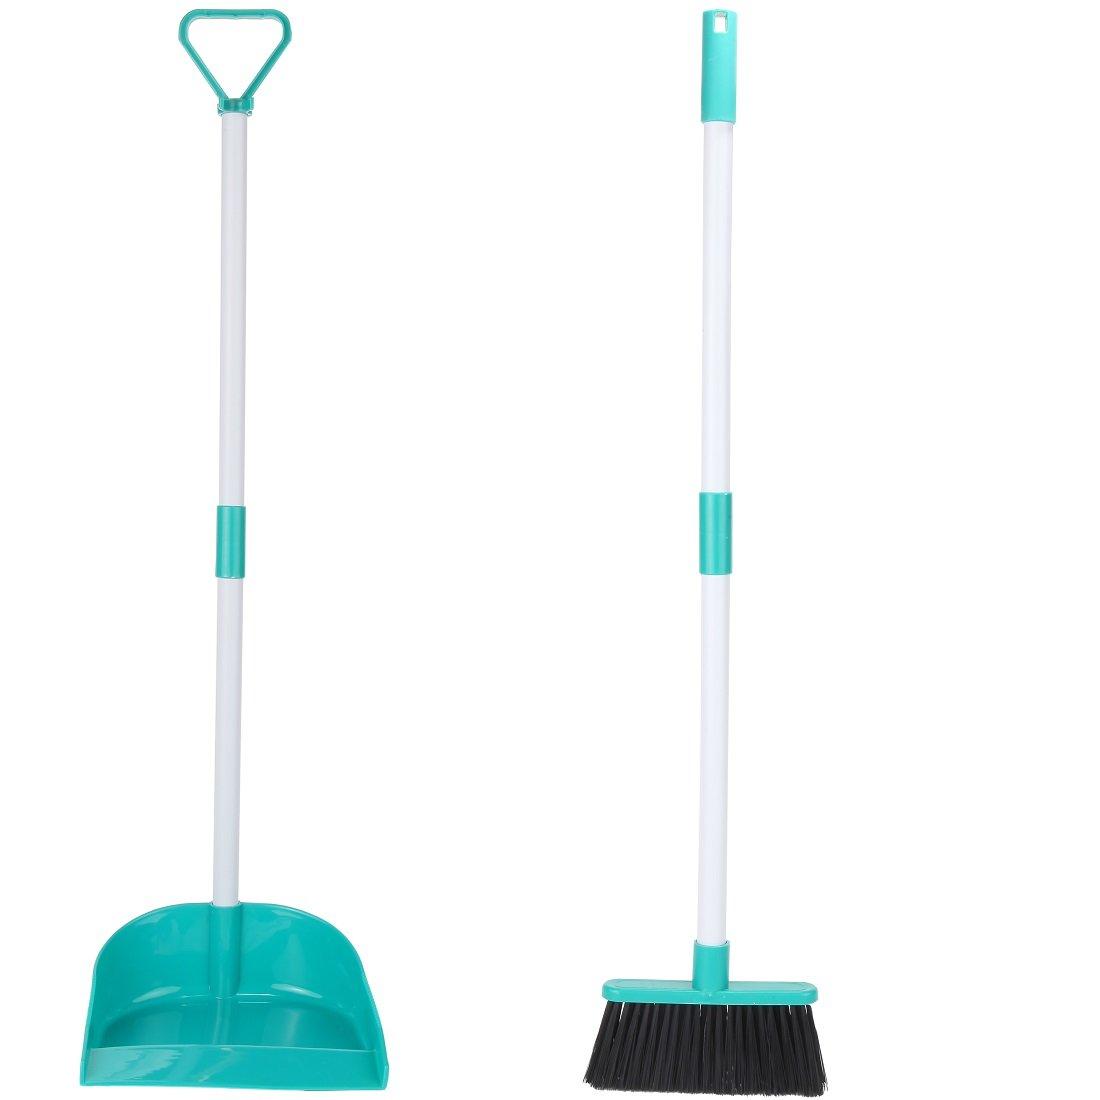 Home-X Broom and Dustpan Set